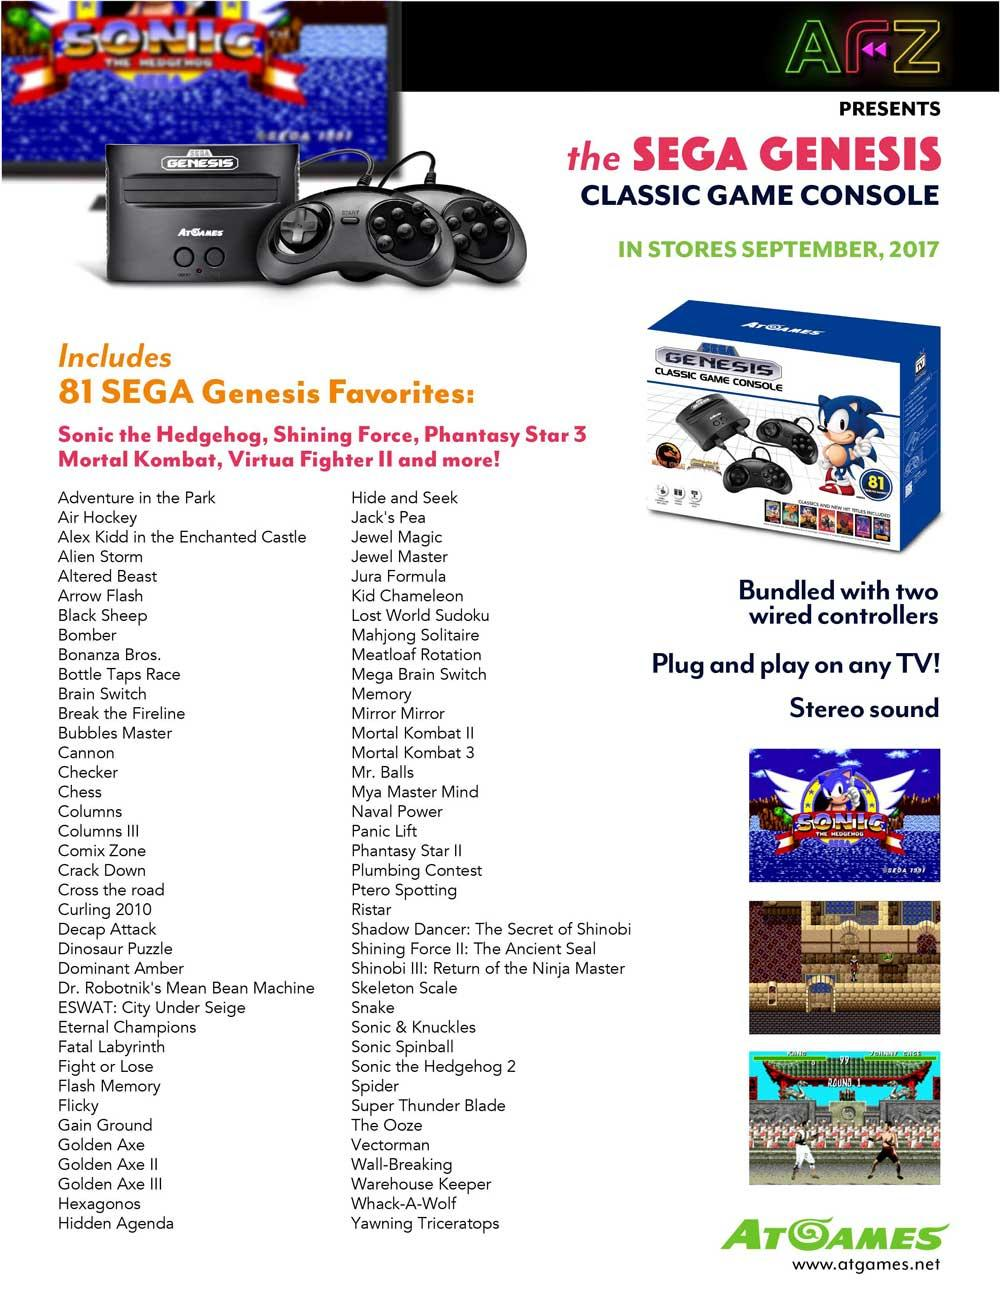 Resucitan la sega genesis mega drive y la atari 2600 en - Atgames sega genesis classic game console game list ...